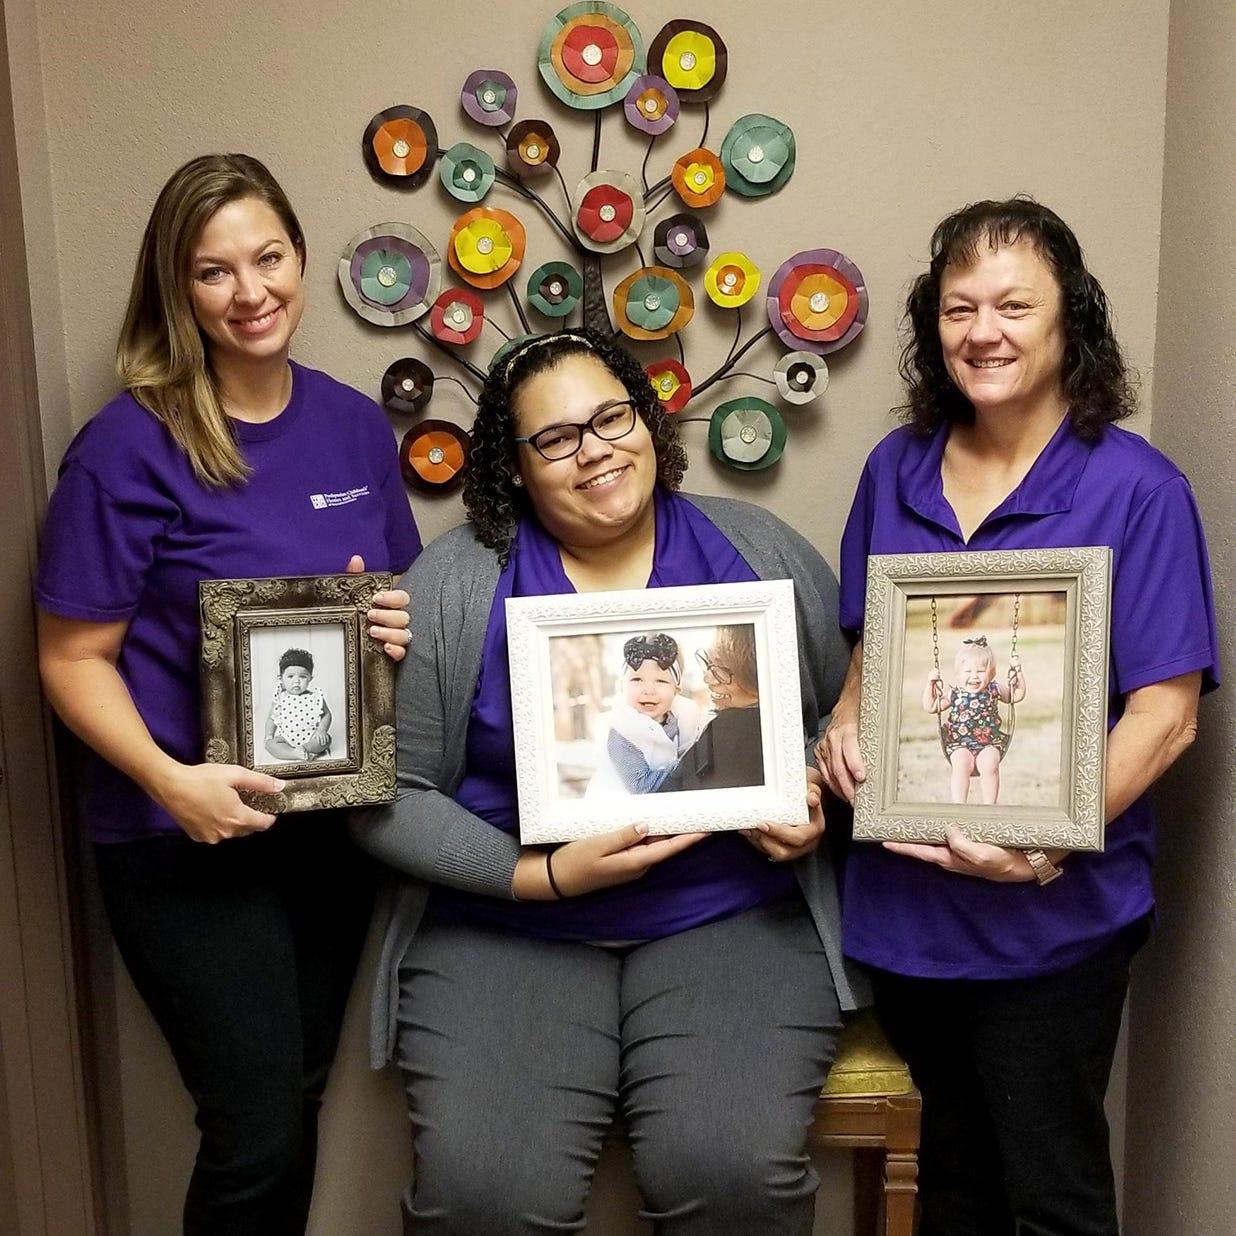 Presbyterian Children's Home case workers open hearts, Wichita Falls homes to children